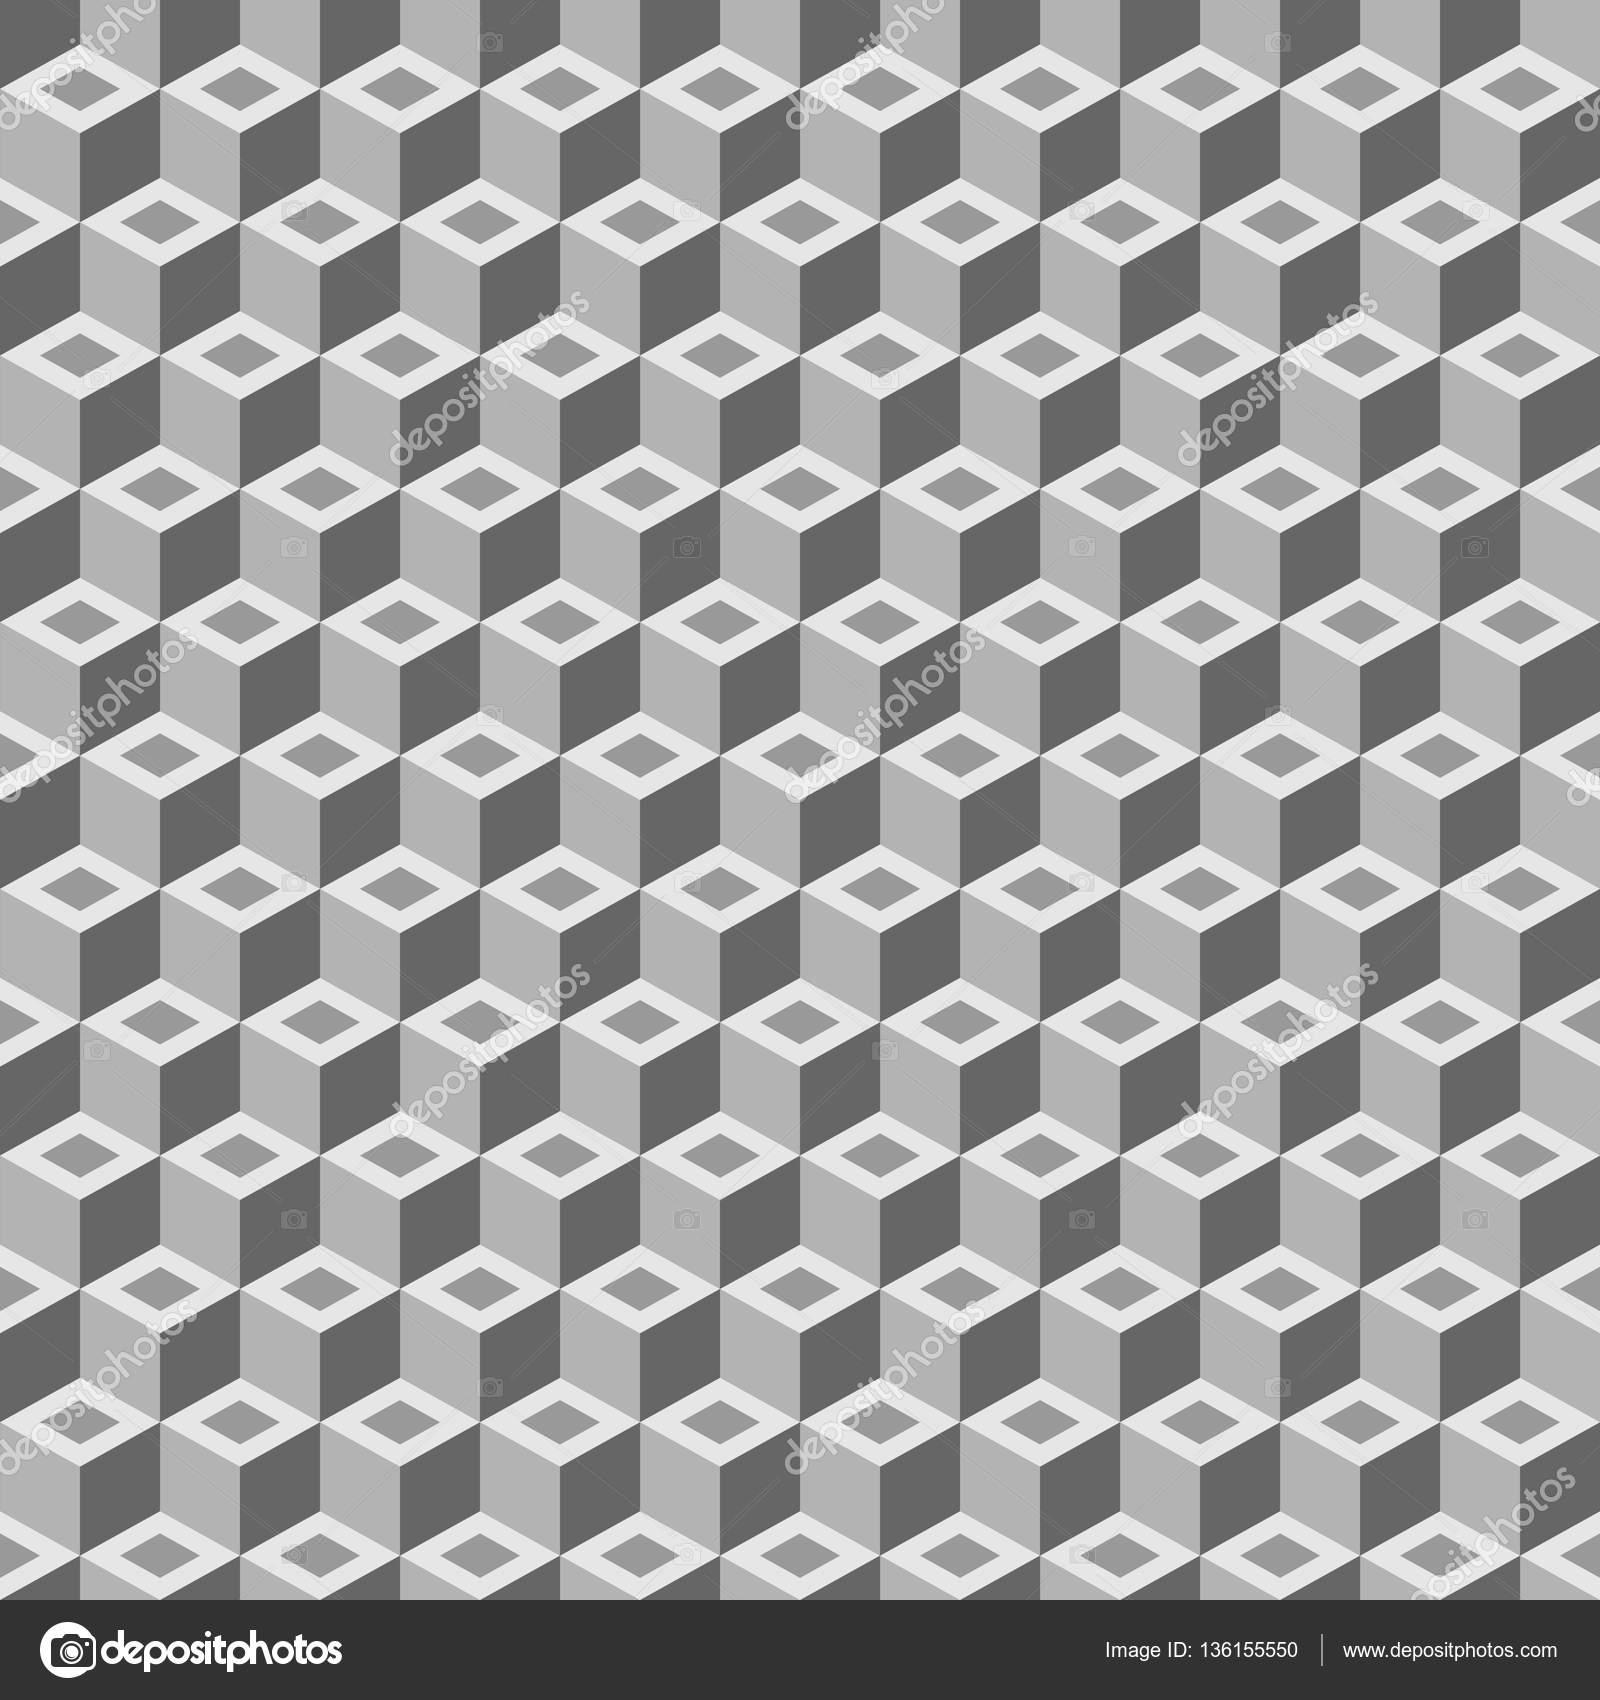 geometrischen Würfels Musterdesign. Mode-Grafik-Design. Vektor ...